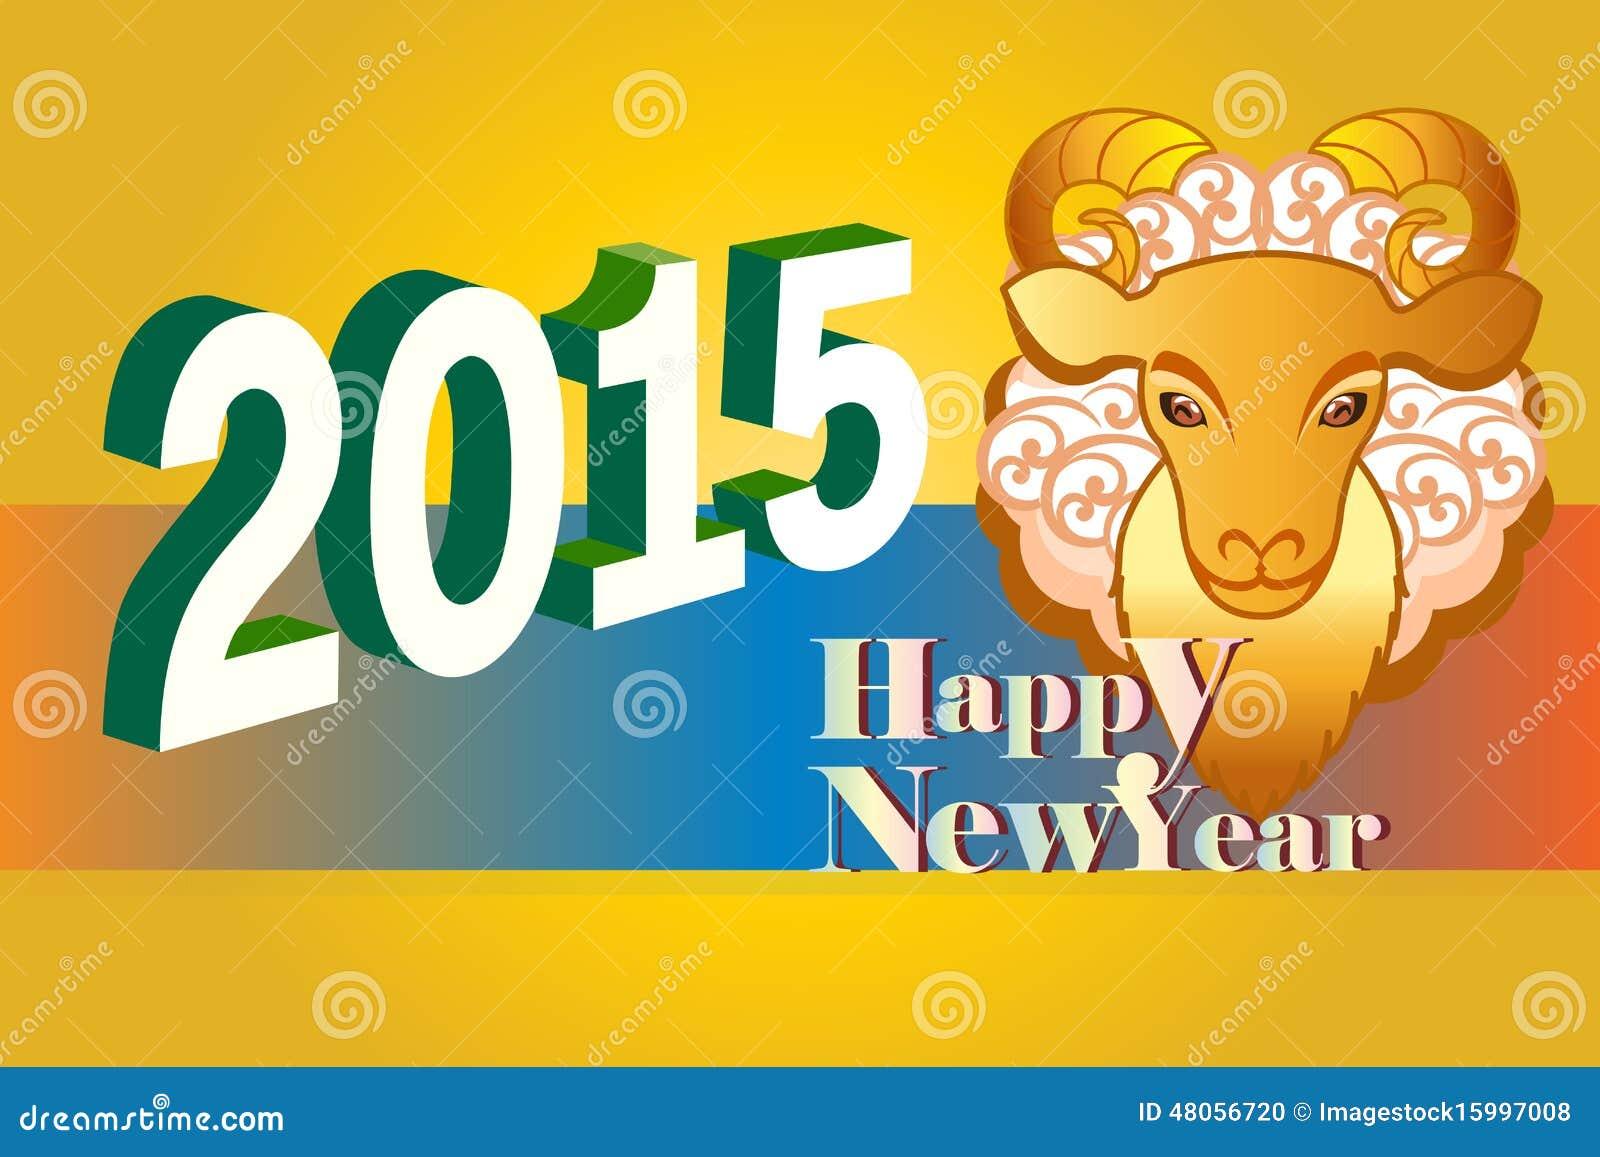 Happy new year korean hd wallpapers plus 2015 korean happy new year m4hsunfo